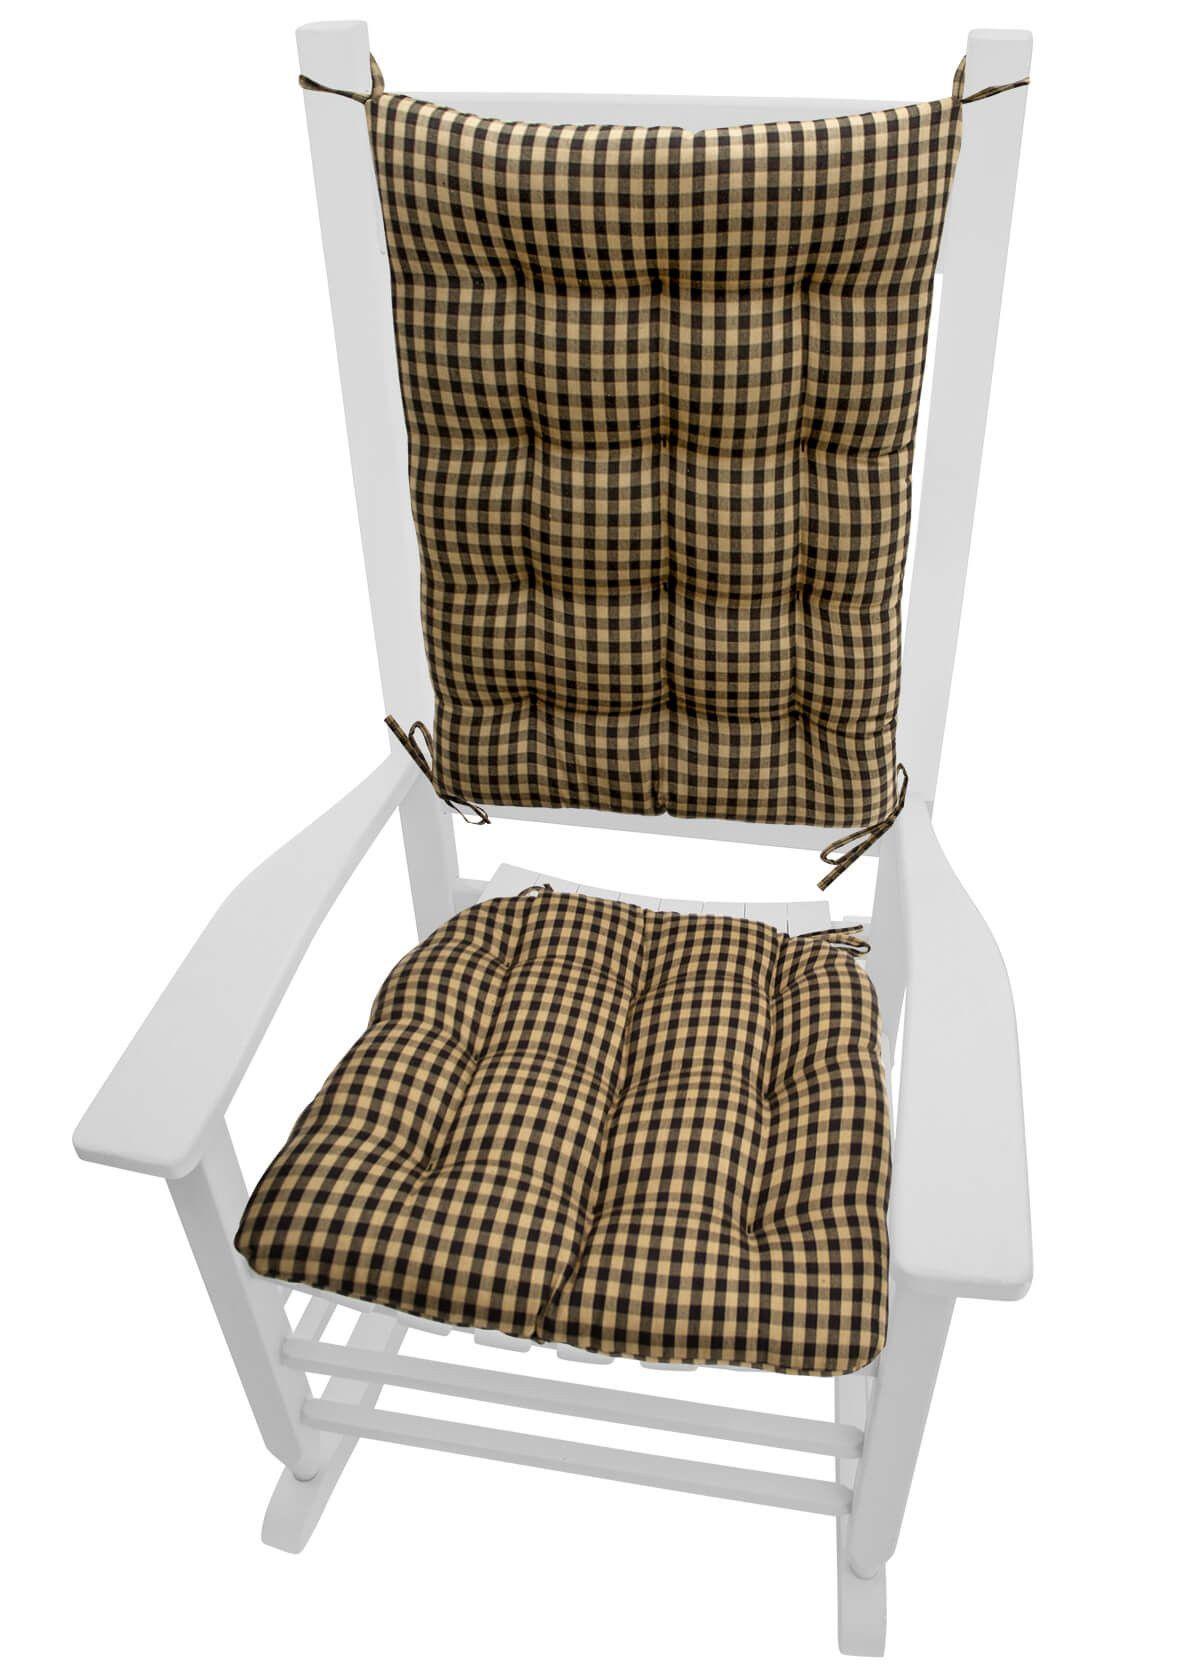 Checkers black u tan checkered rocking chair cushions latex foam